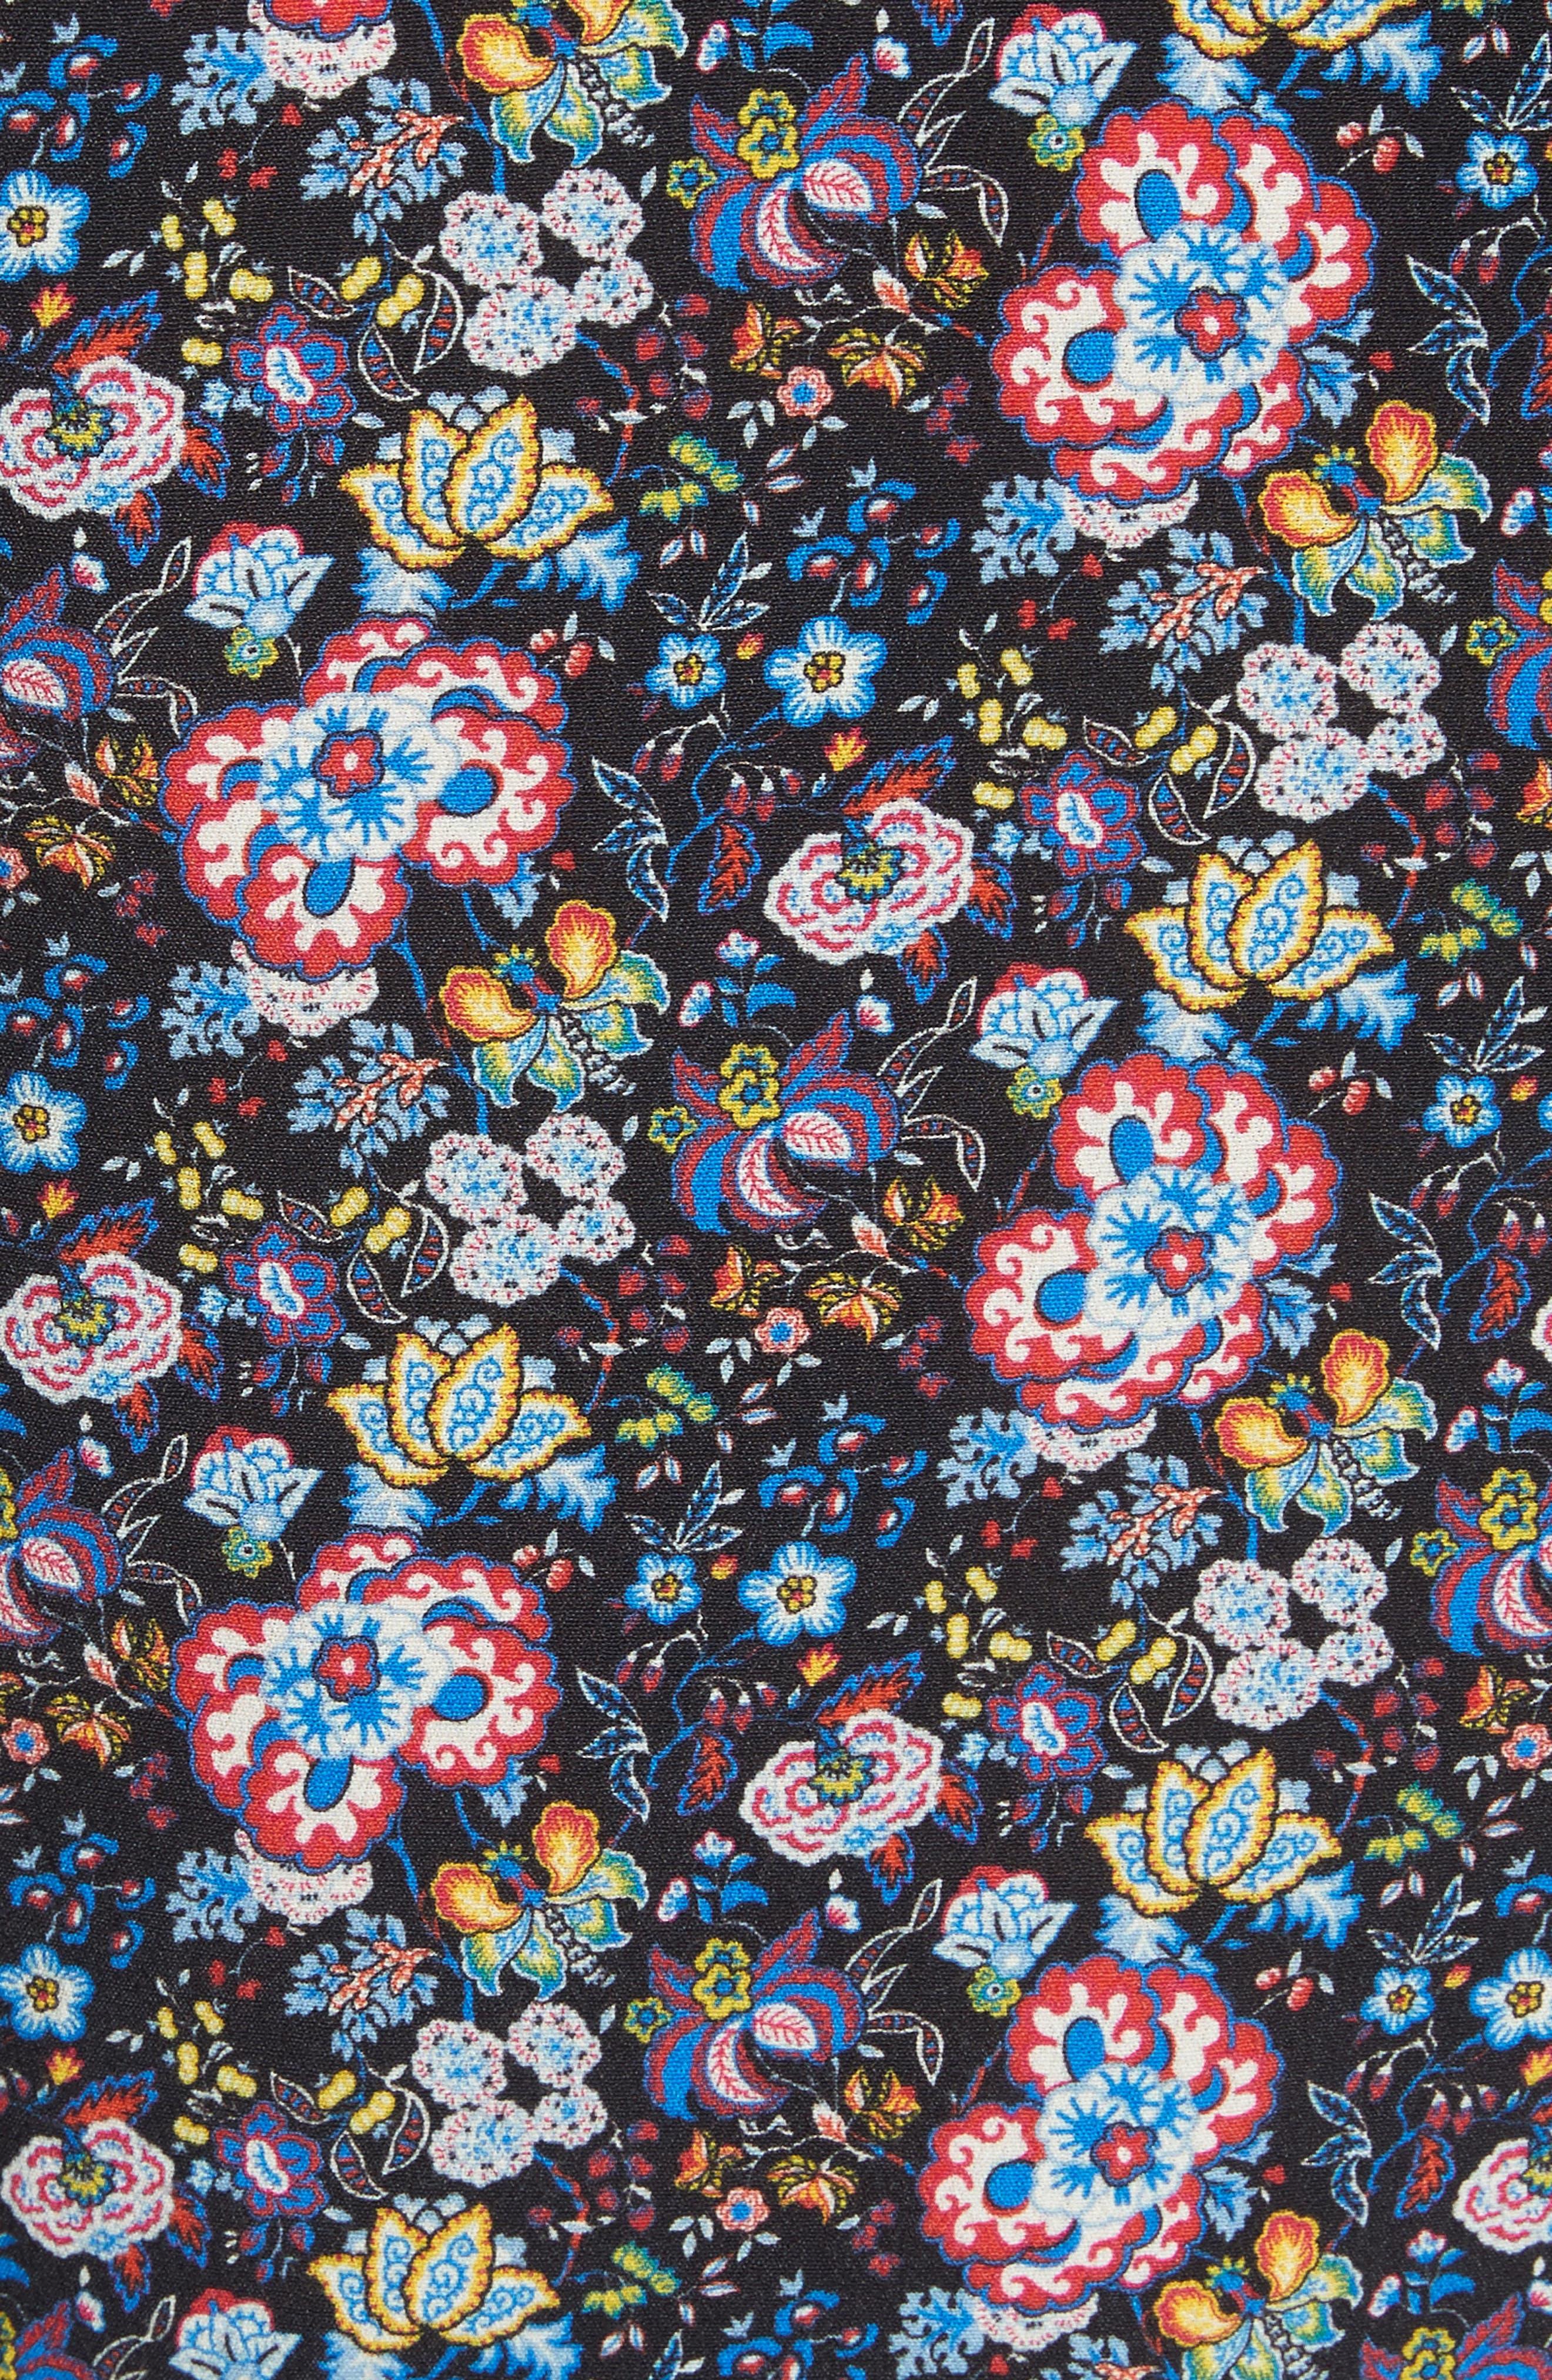 Floral Print One-Shoulder Top,                             Alternate thumbnail 8, color,                             Coastal Blue Multi